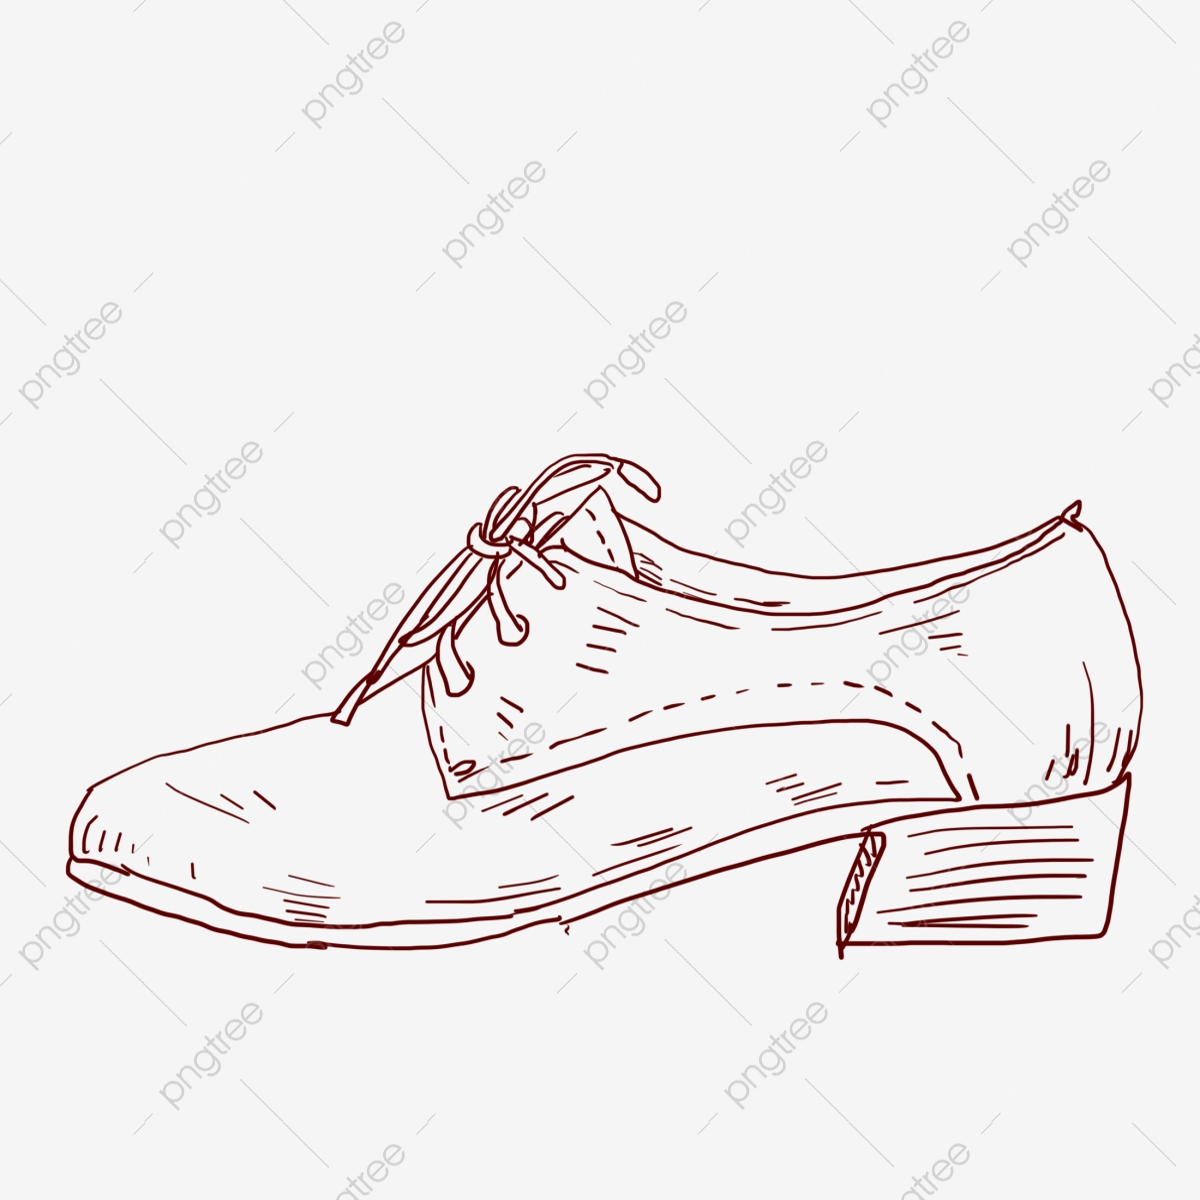 Atadas Desnudas botas desnudas de dibujo lineal botas de tacón bajo tacones